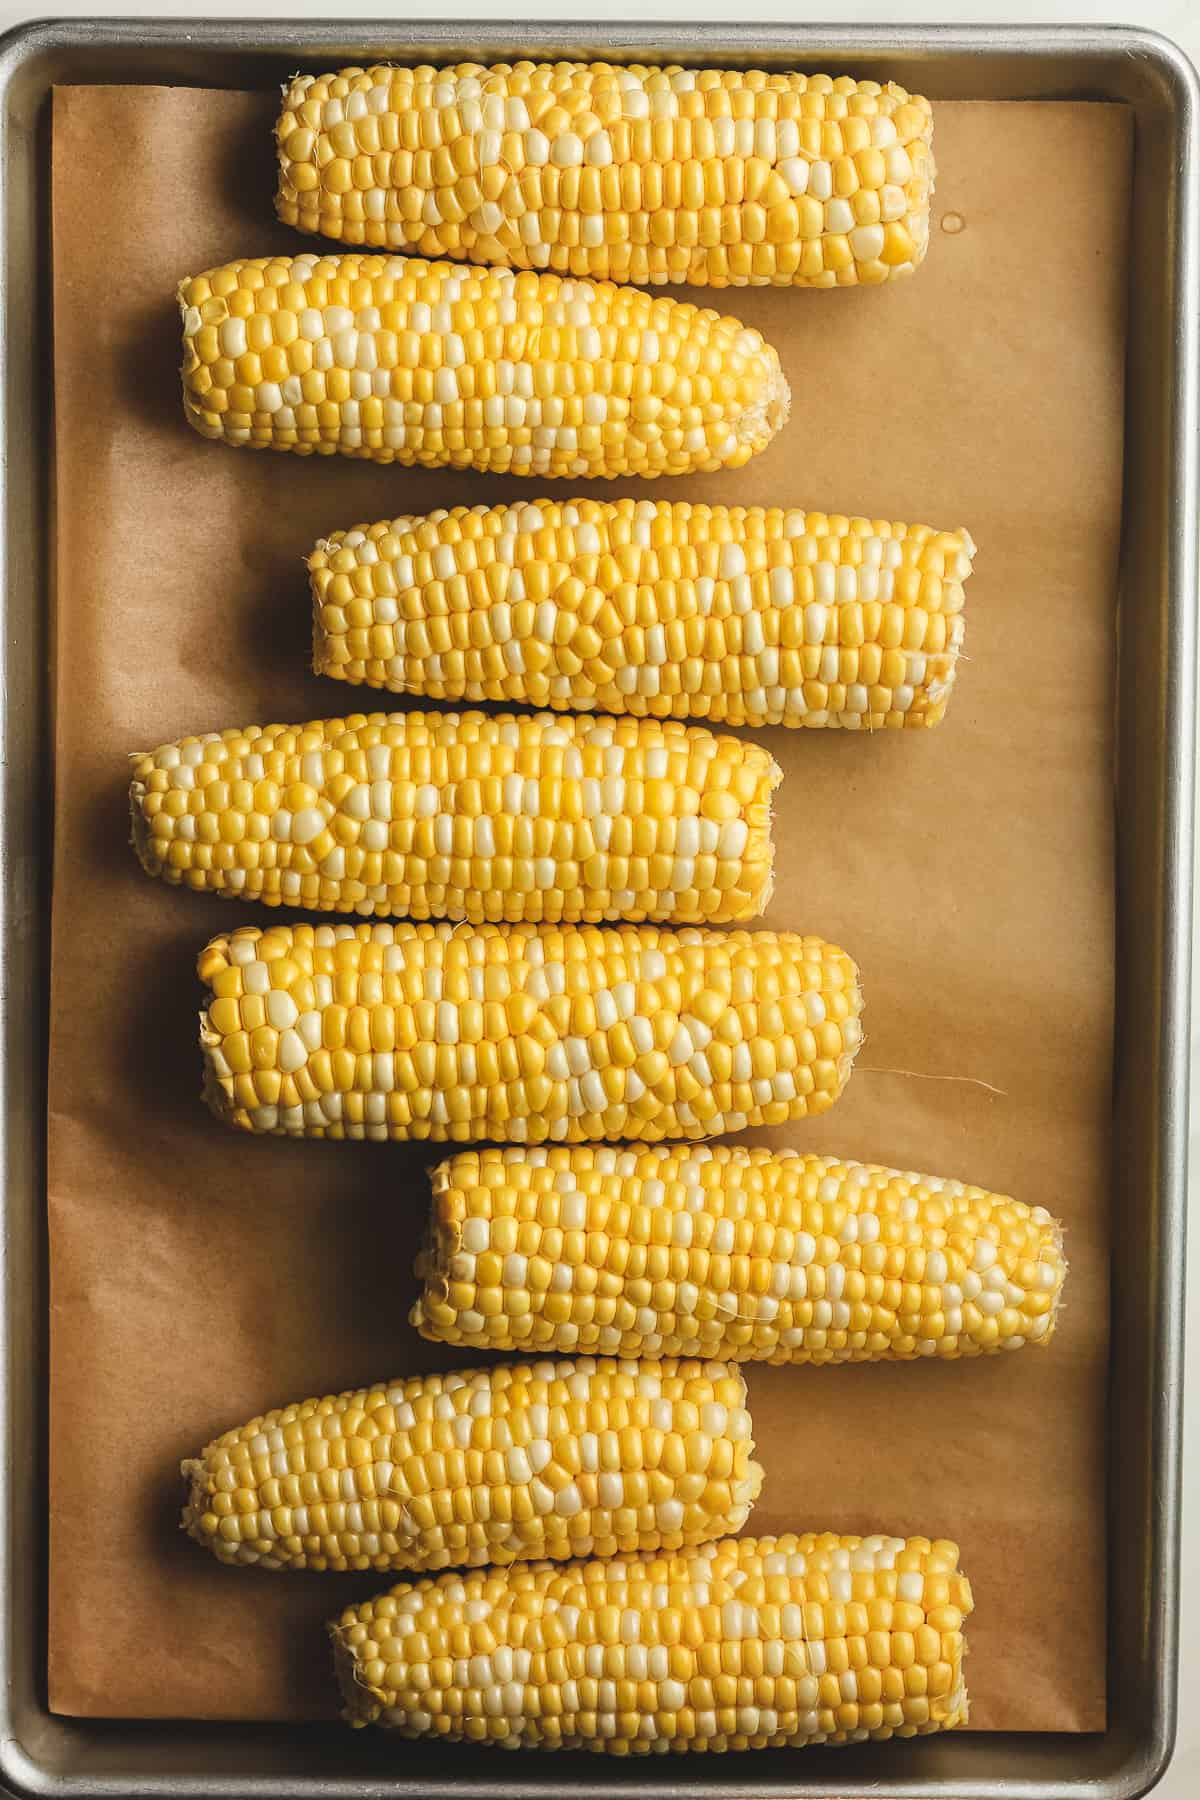 8 medium ears of corn on a baking sheet.